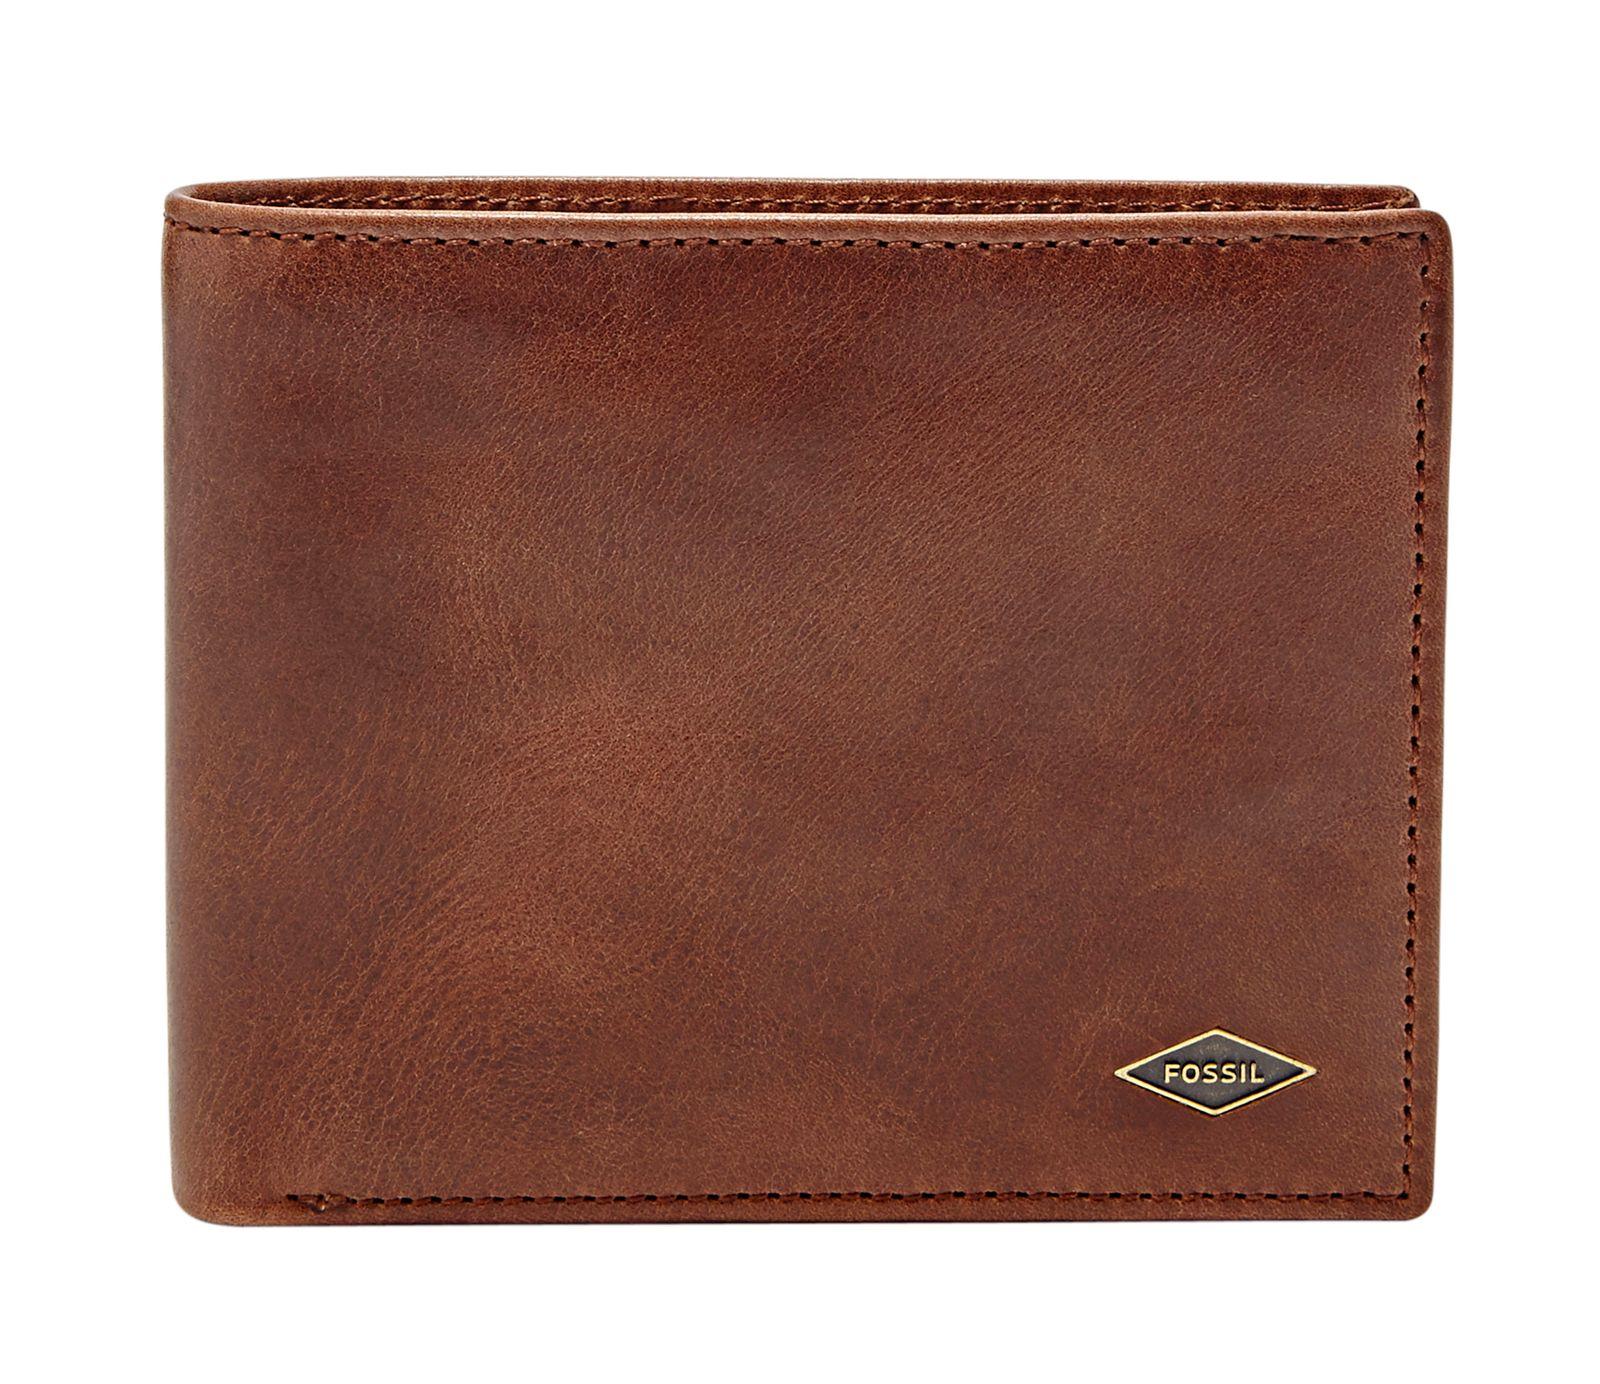 FOSSIL Ryan Large Coin Pocket Bifold RFID Dark Brown